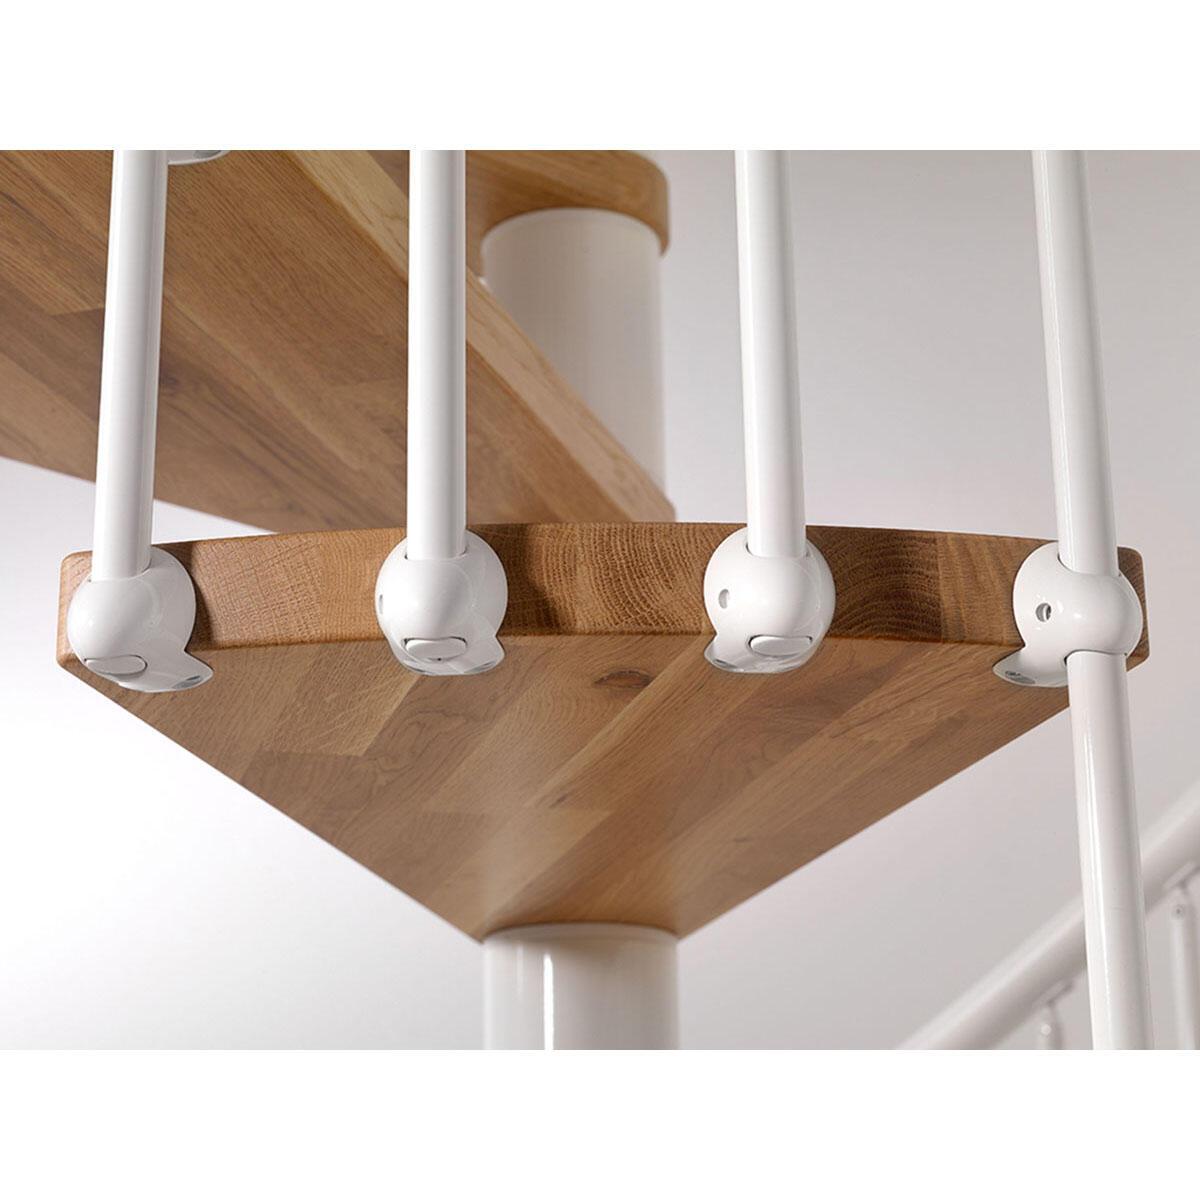 Scala a chiocciola tonda OAK70 FONTANOT L 110 cm, gradino naturale, struttura bianco - 2